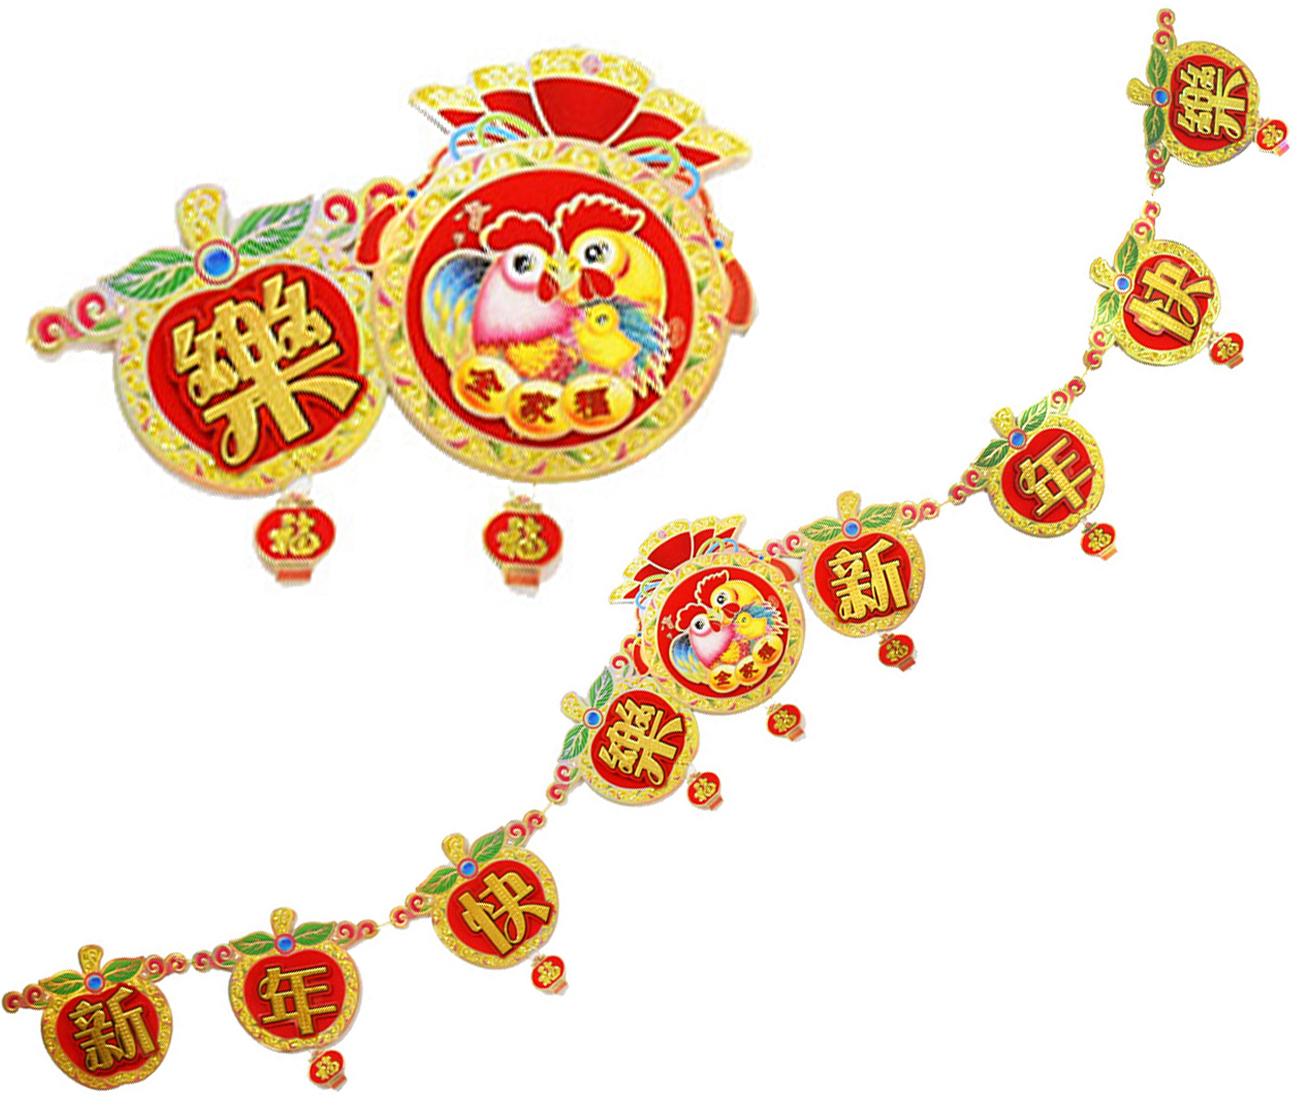 X射線【Z715006】新年快樂拉條-蘋果,春節/過年佈置/雞年/掛飾/吊飾/送禮/裝飾